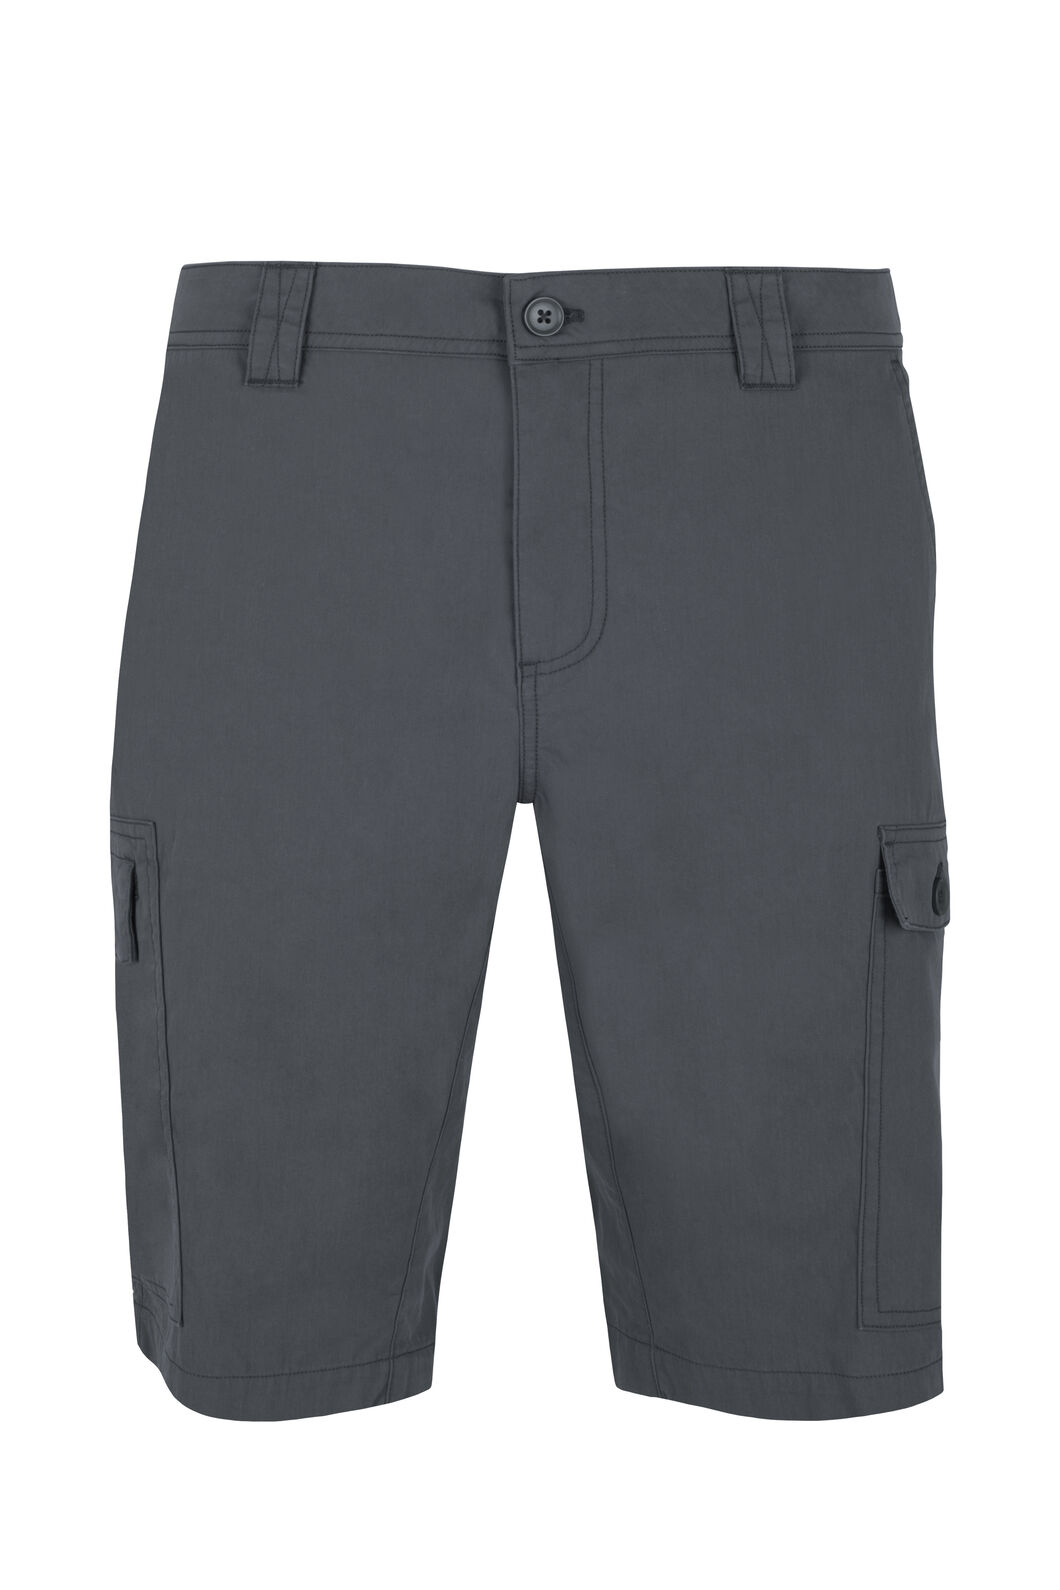 Macpac Matrix Shorts - Men's, Iron Gate, hi-res